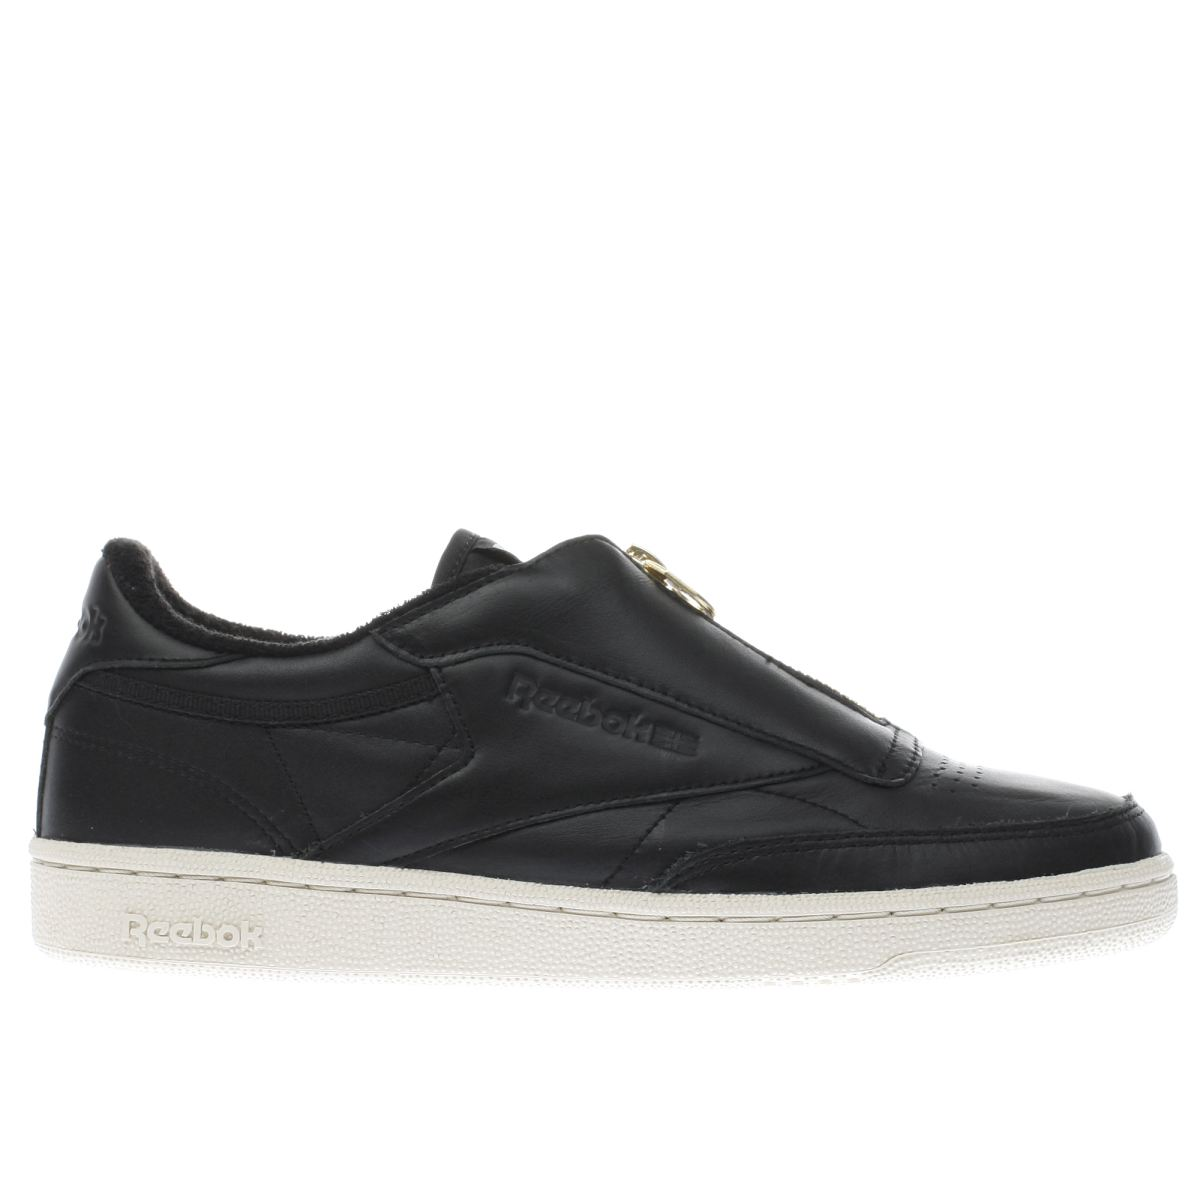 reebok black club c 85 zip trainers